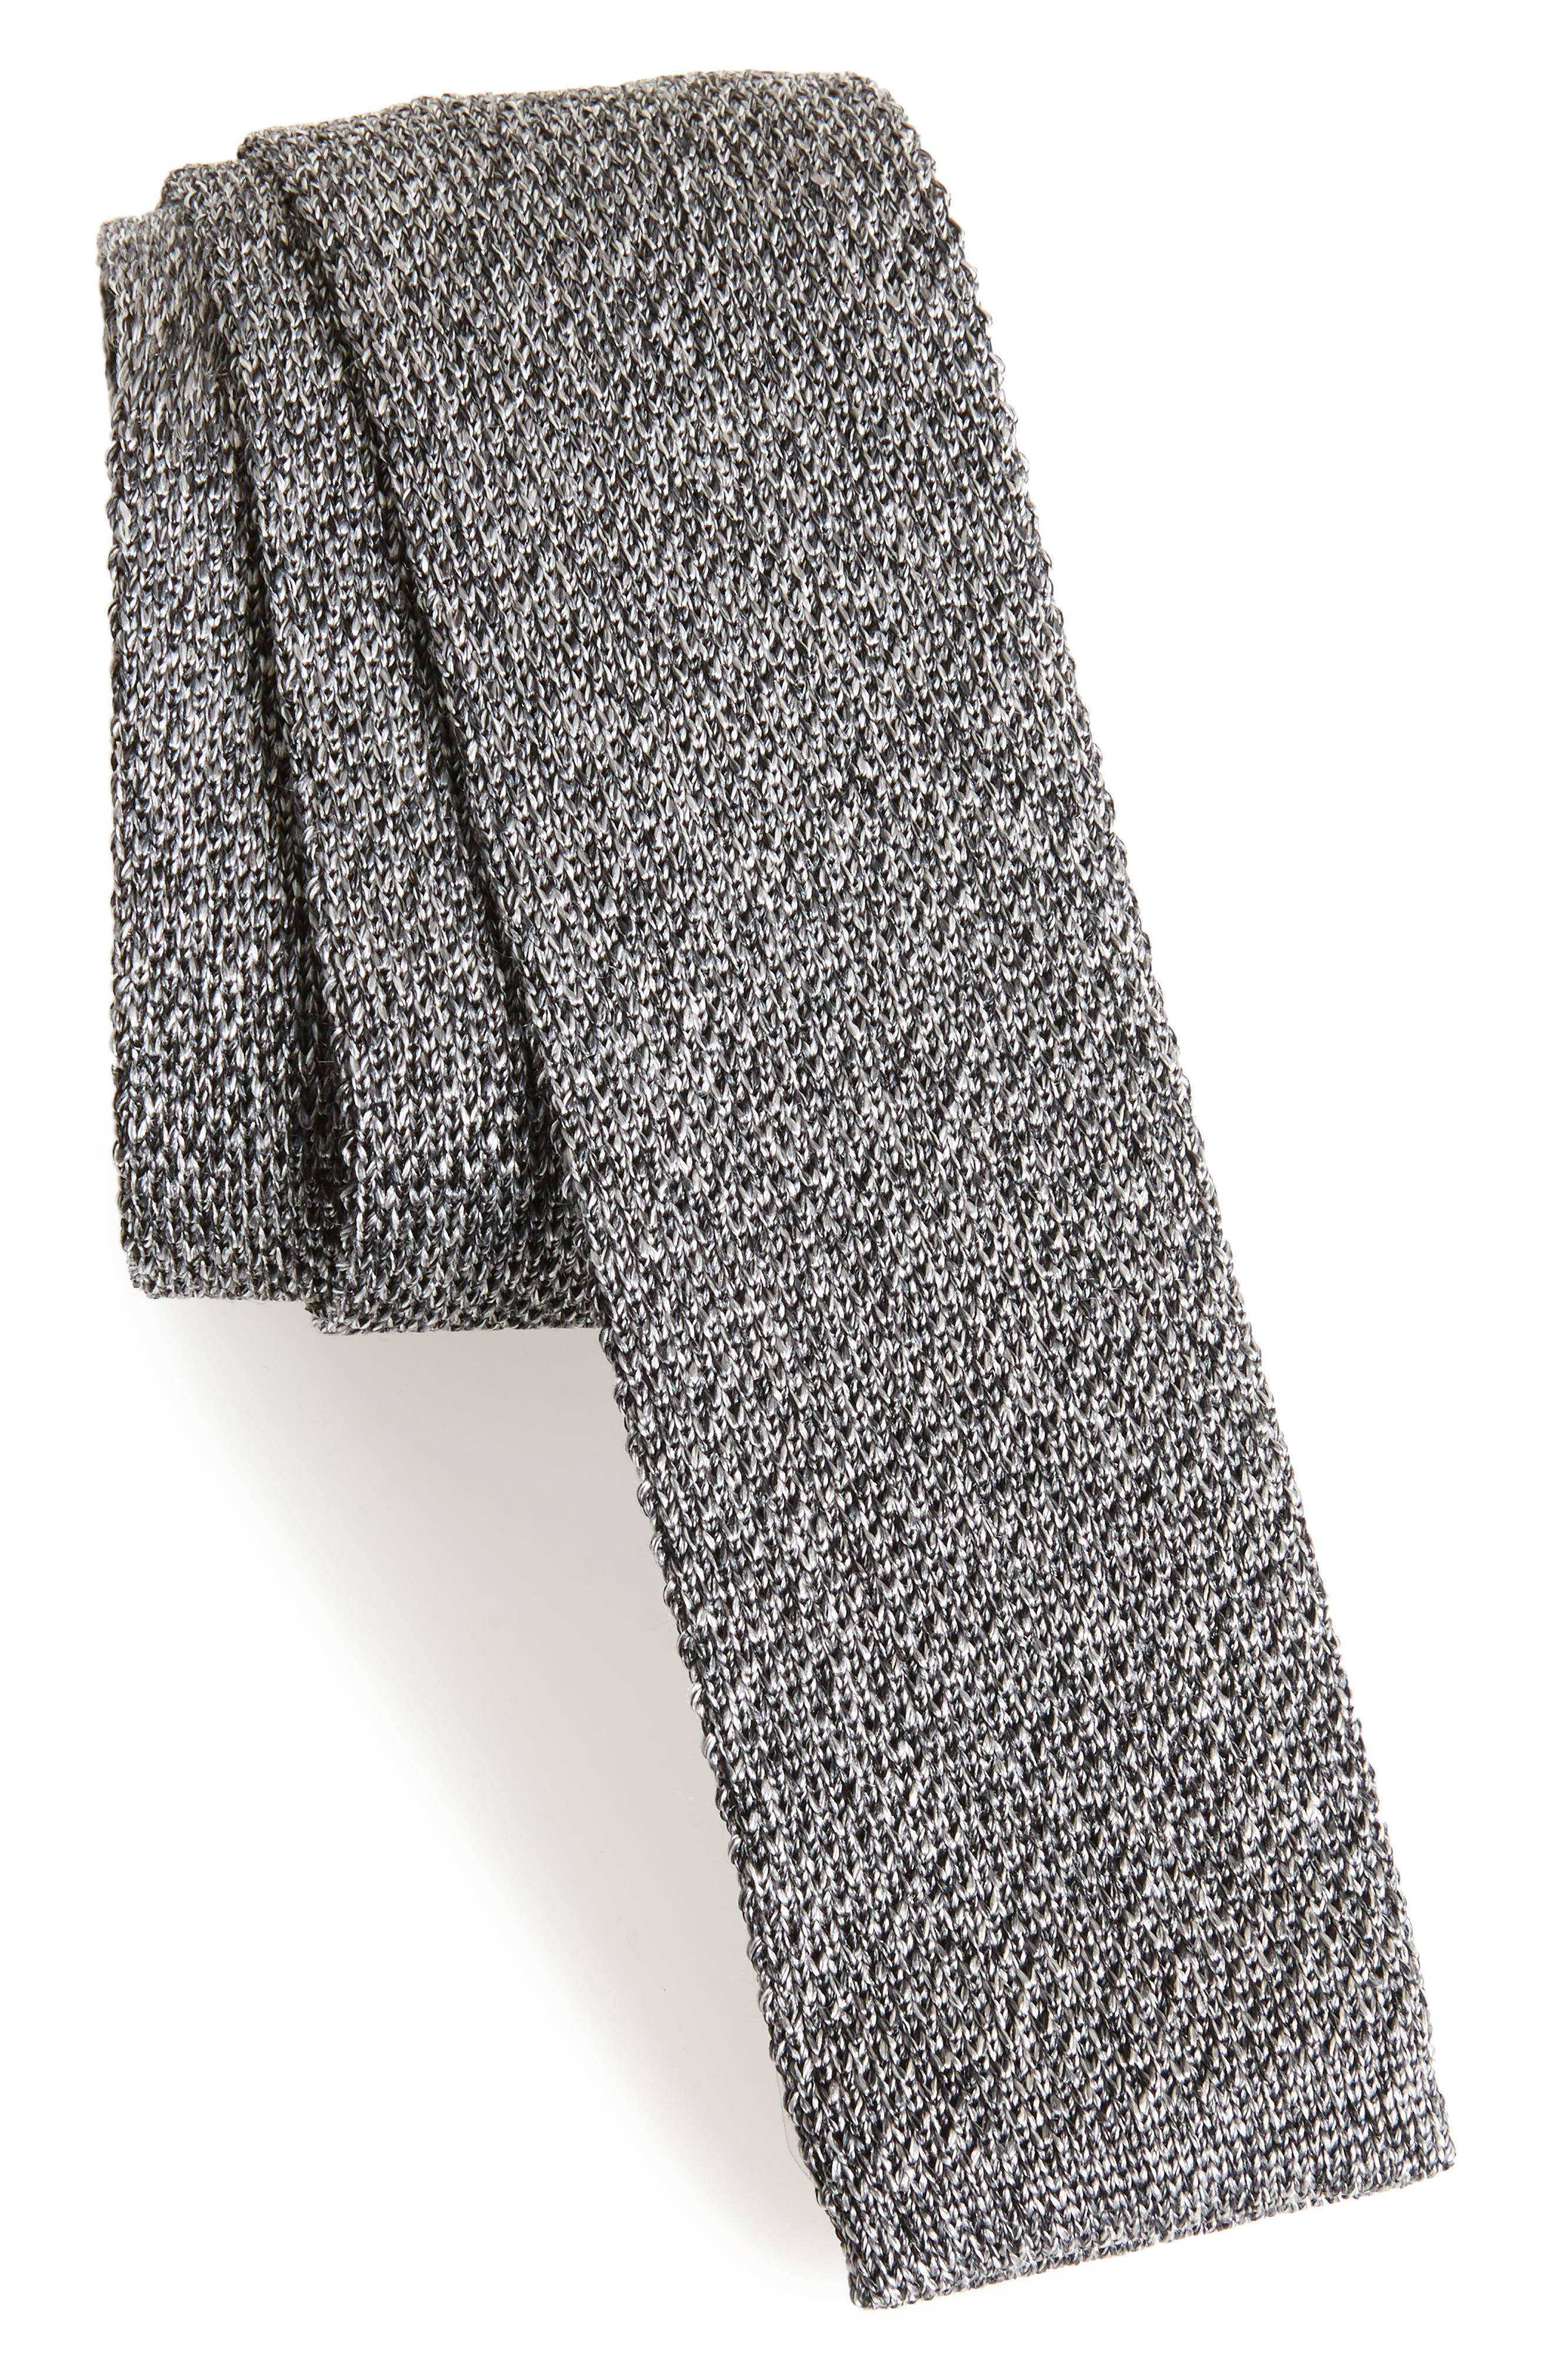 Solid Knit Silk Tie,                             Main thumbnail 1, color,                             DARK GREY